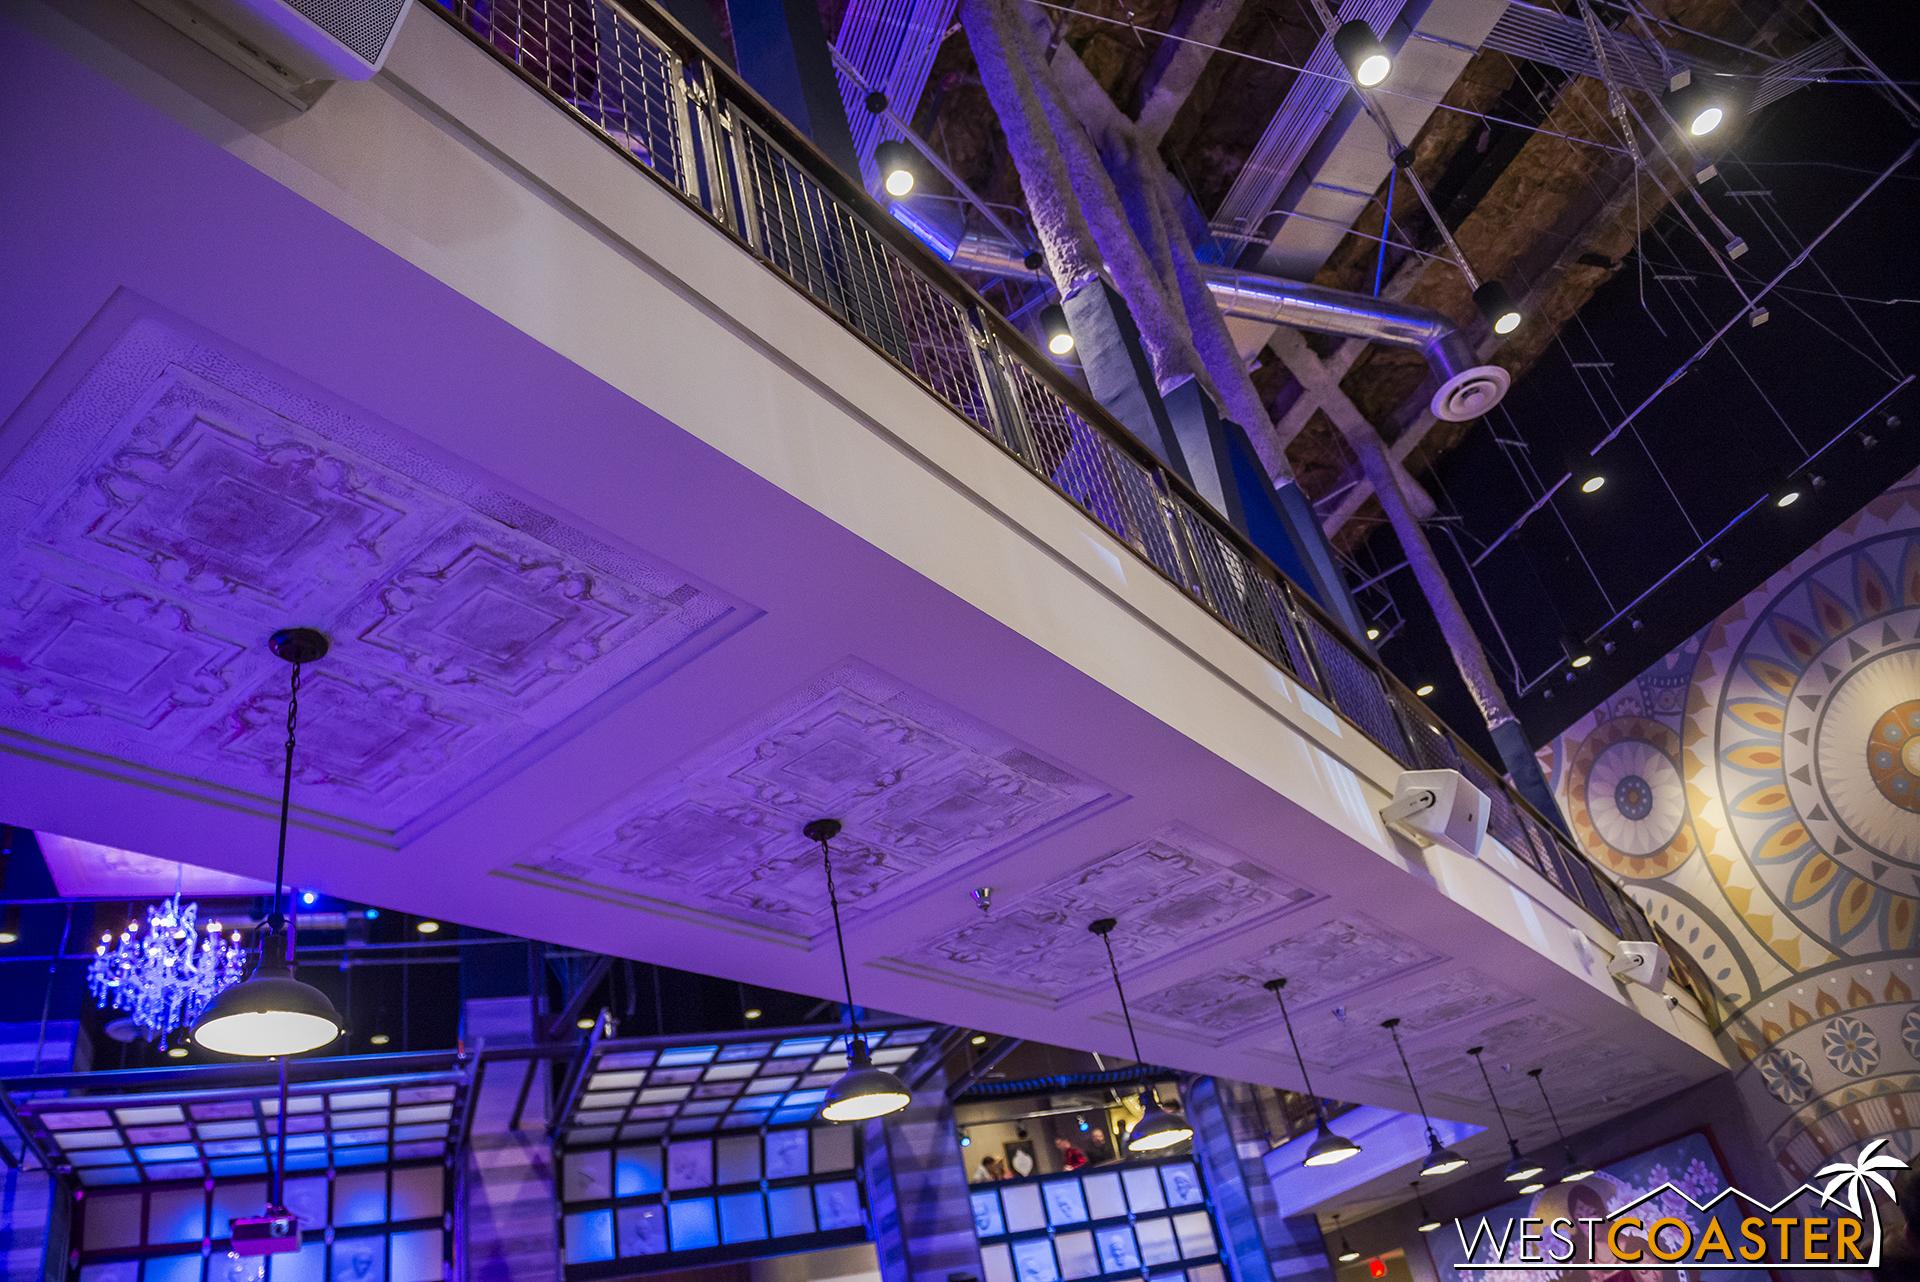 The main restaurant and bar area. Pendant lights hang under a catwalk.